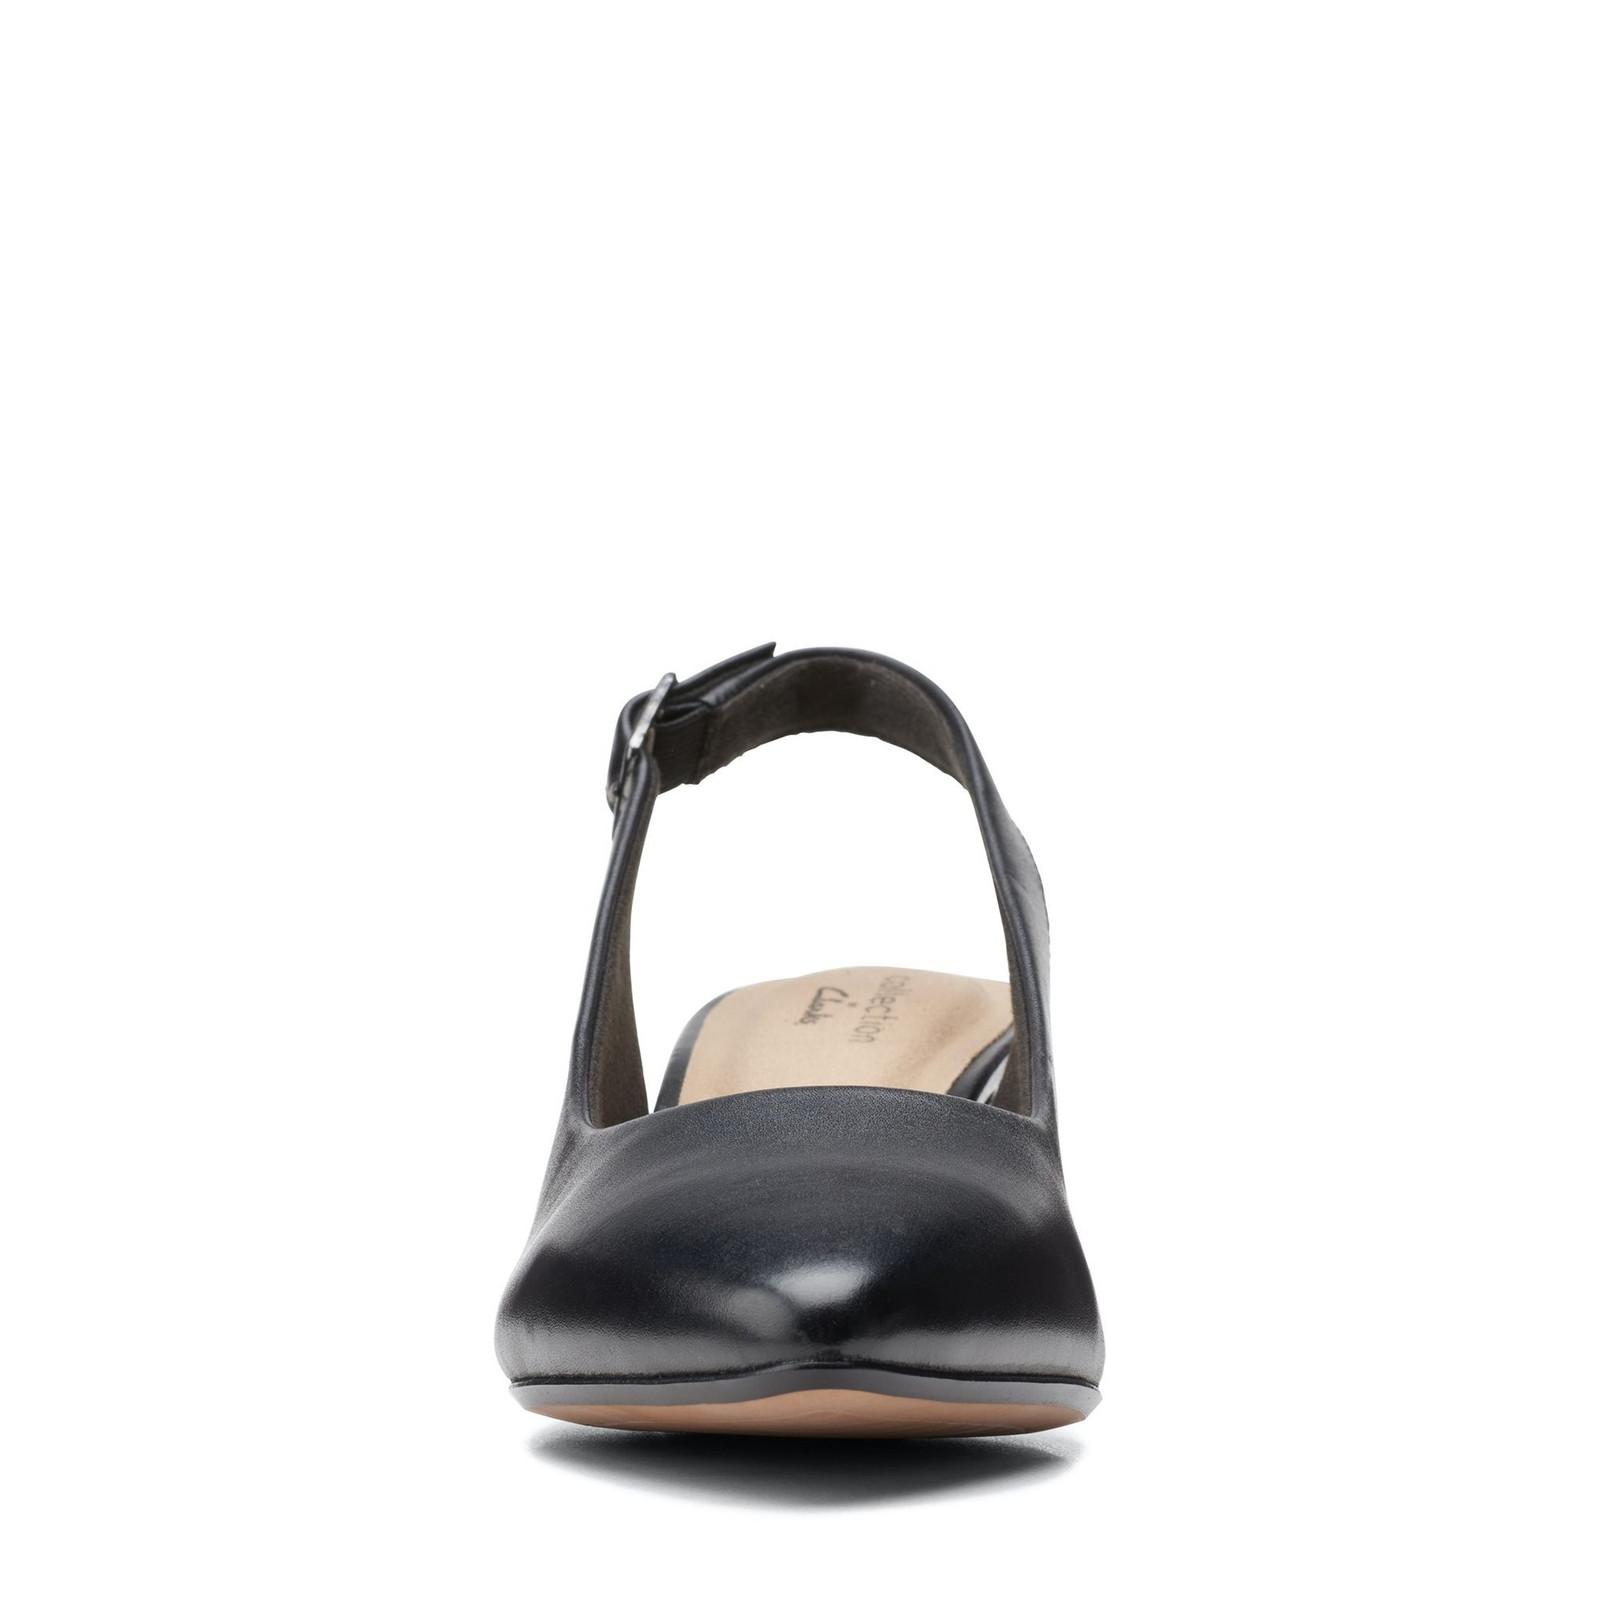 Clarks Womens LINVALE SONDRA Black Leather